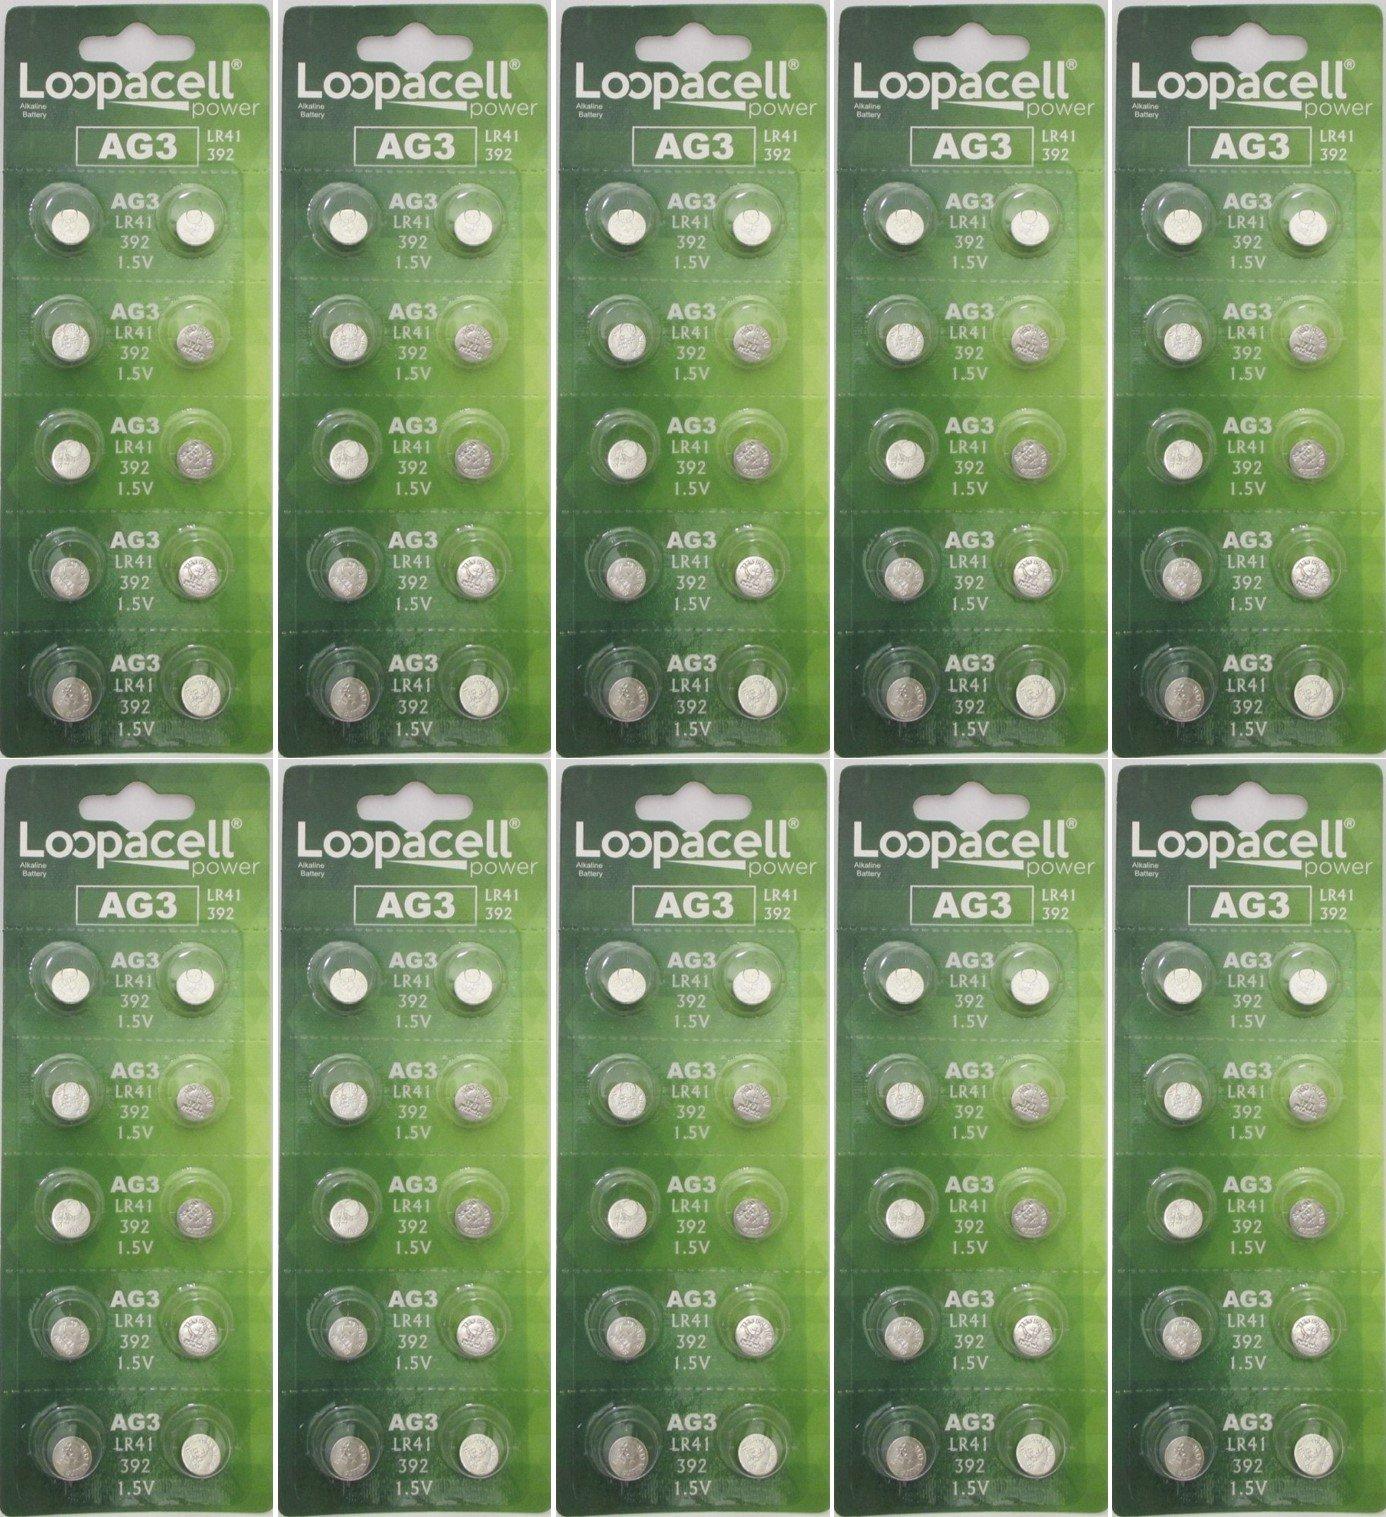 LOOPACELL 100 Pack AG3 LR41 392 SR41SW 384 192 V384 V392 D384 D392 280-13 Alkaline Button Cell Battery